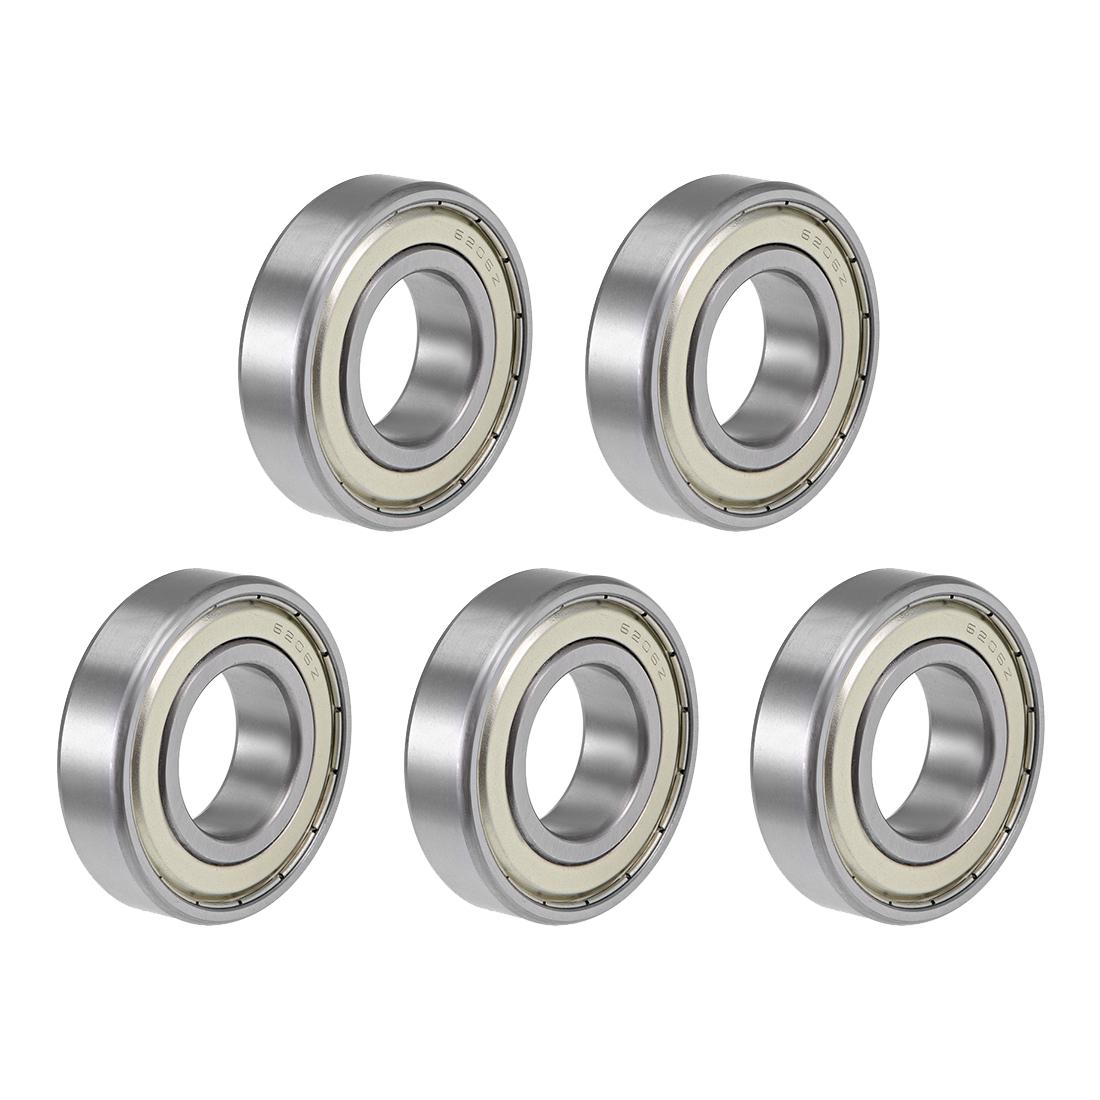 6206ZZ Ball Bearing 30x62x16mm Double Shielded ABEC-3 Bearings 5pcs